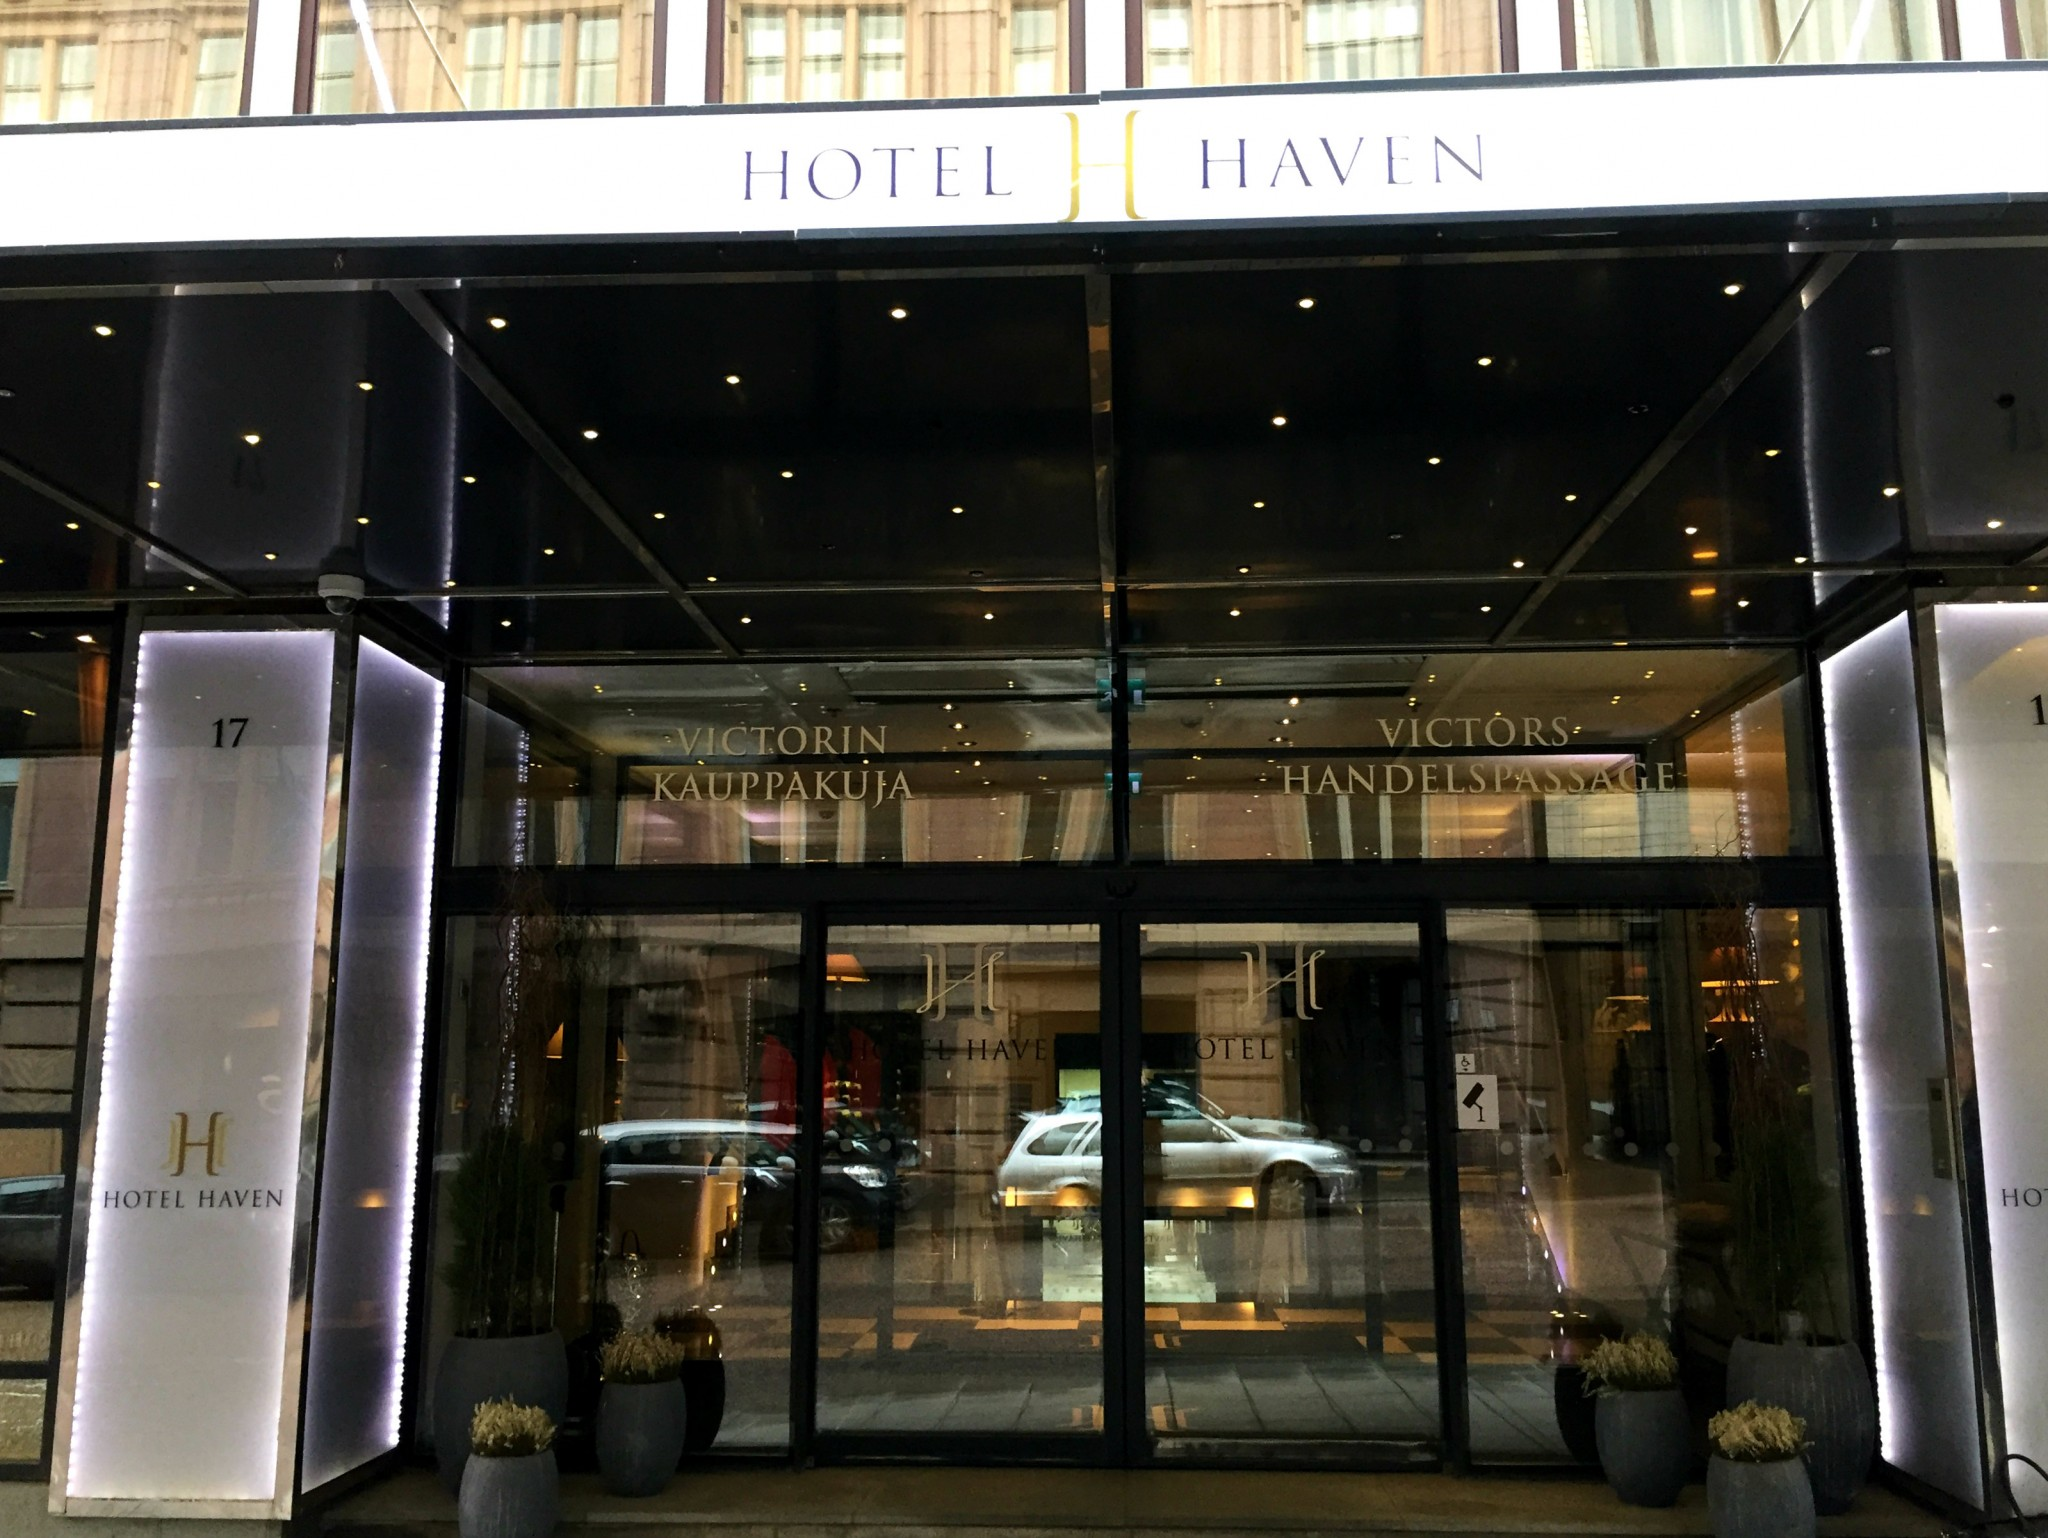 Hotel Haven 1.1